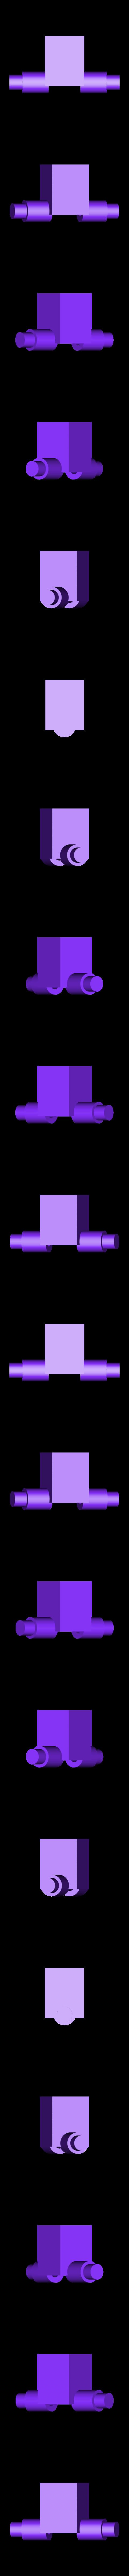 case_cam.stl Download free STL file Mini FPV quad copter kit for V929 or HK Q-bot • Design to 3D print, 3dxl